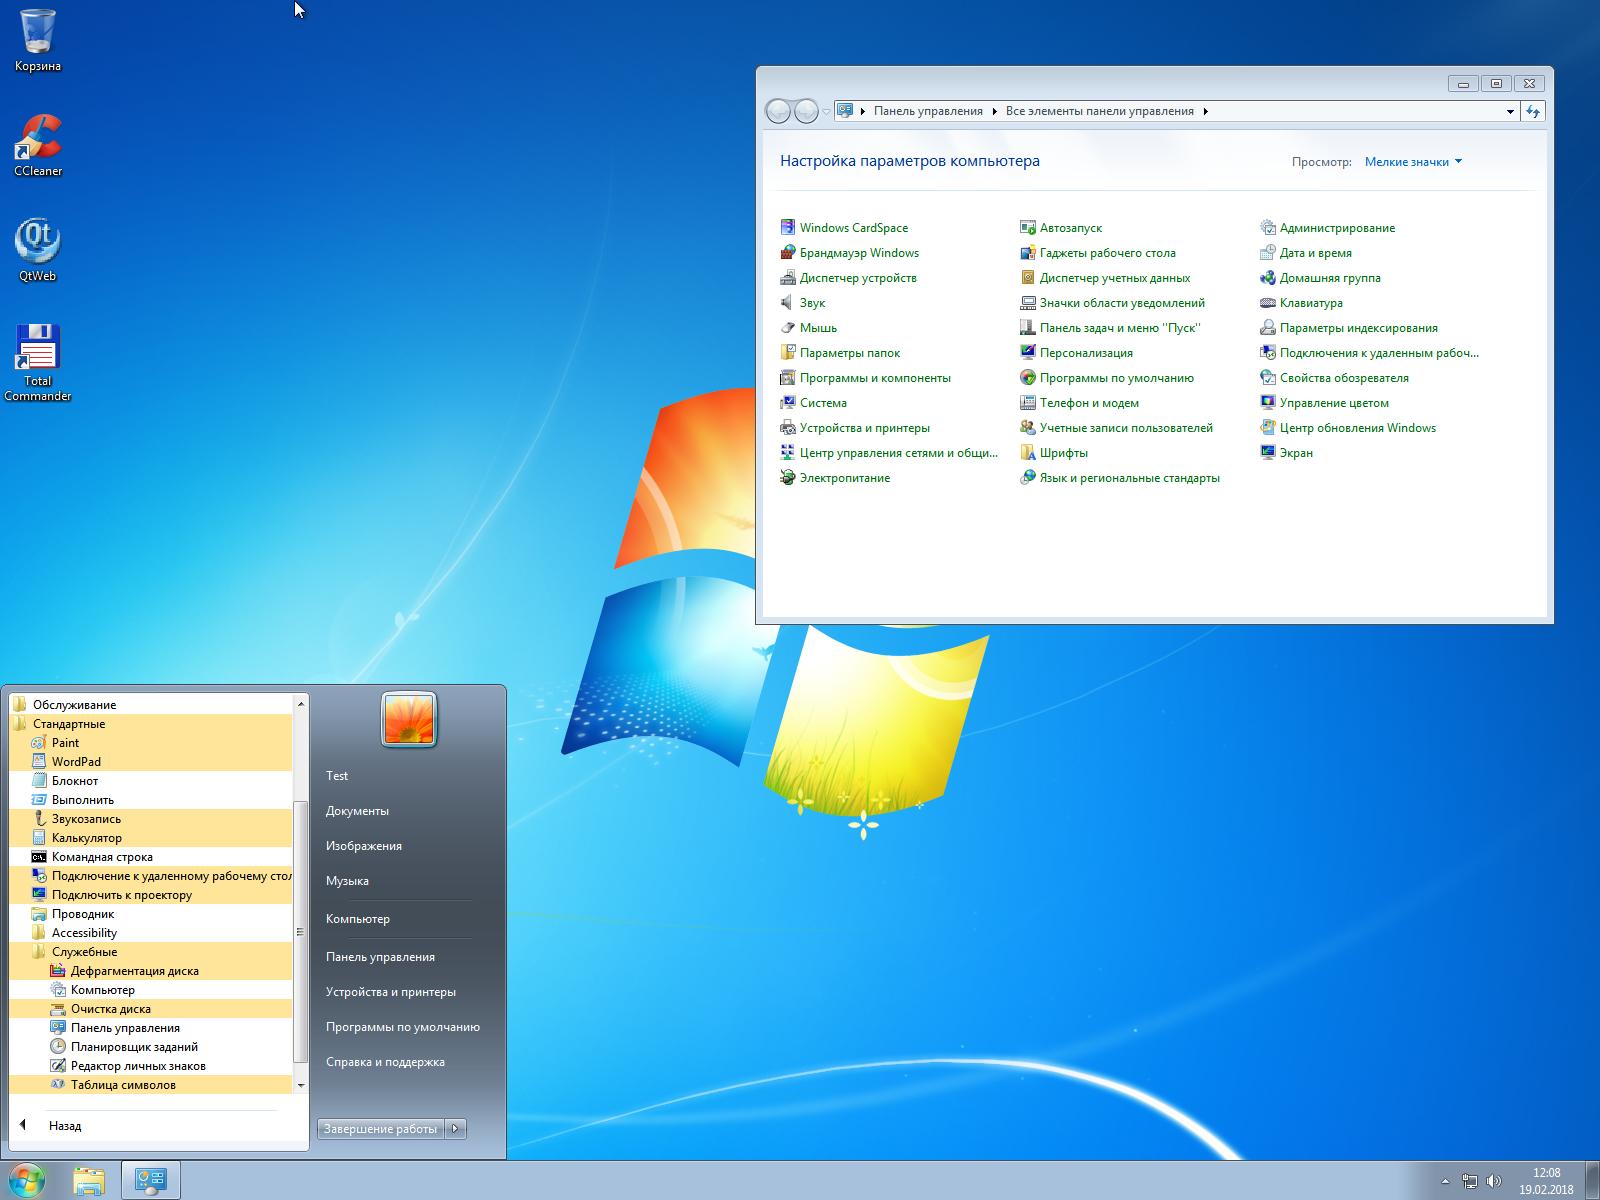 torrent download free windows 7 32bit